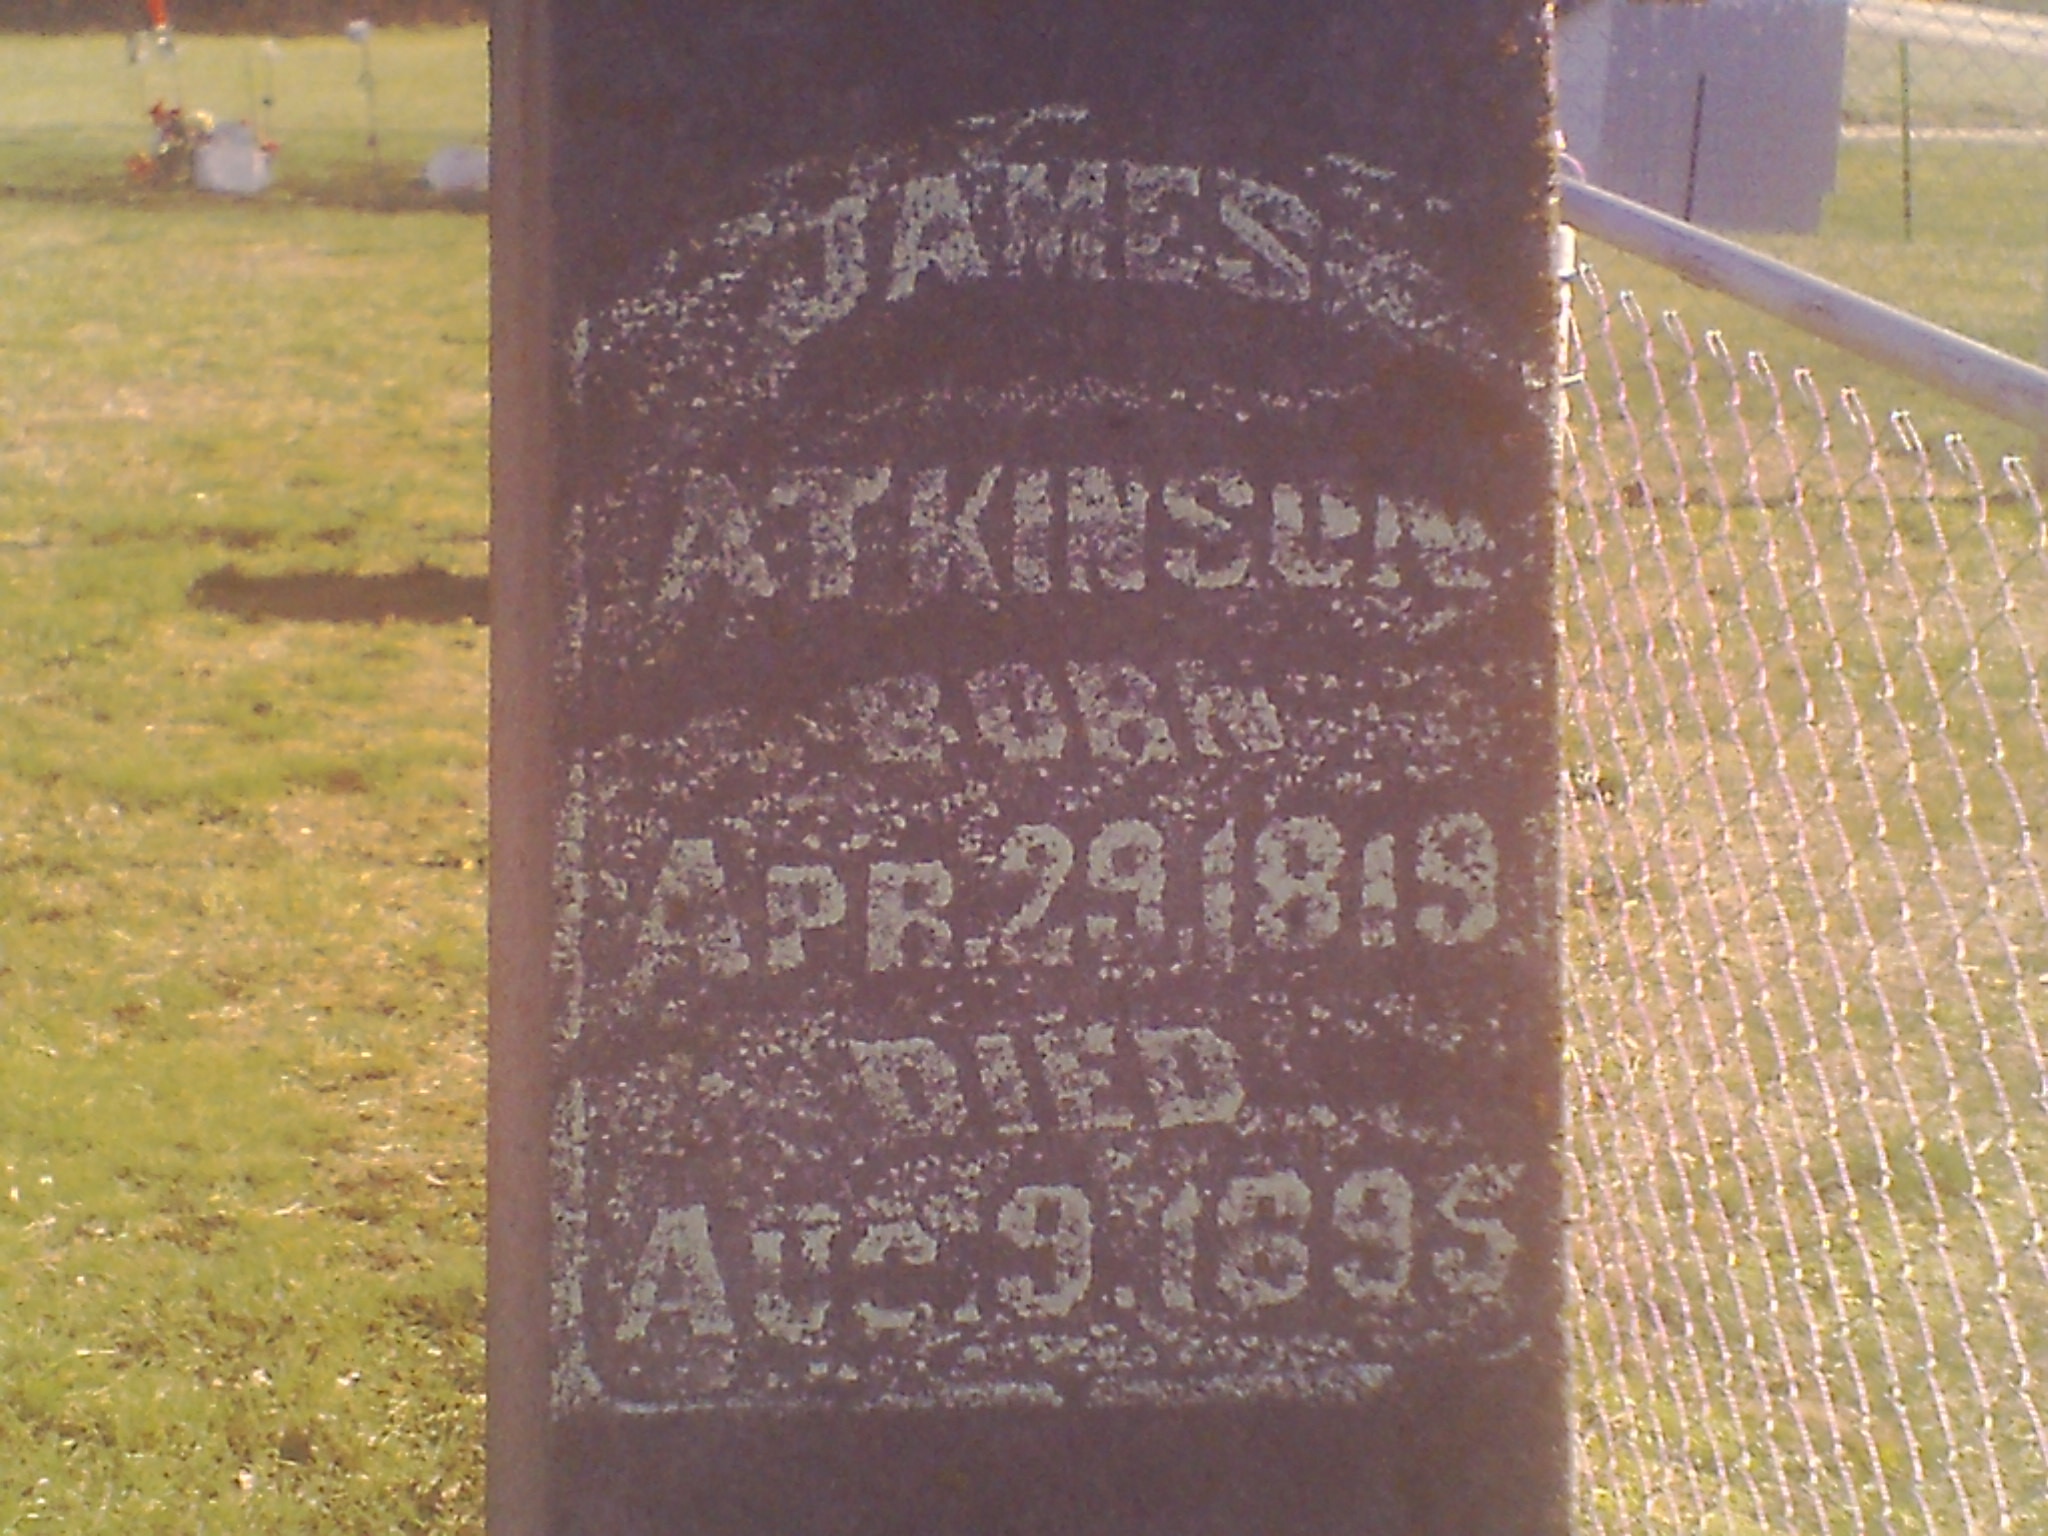 James G Atkinson